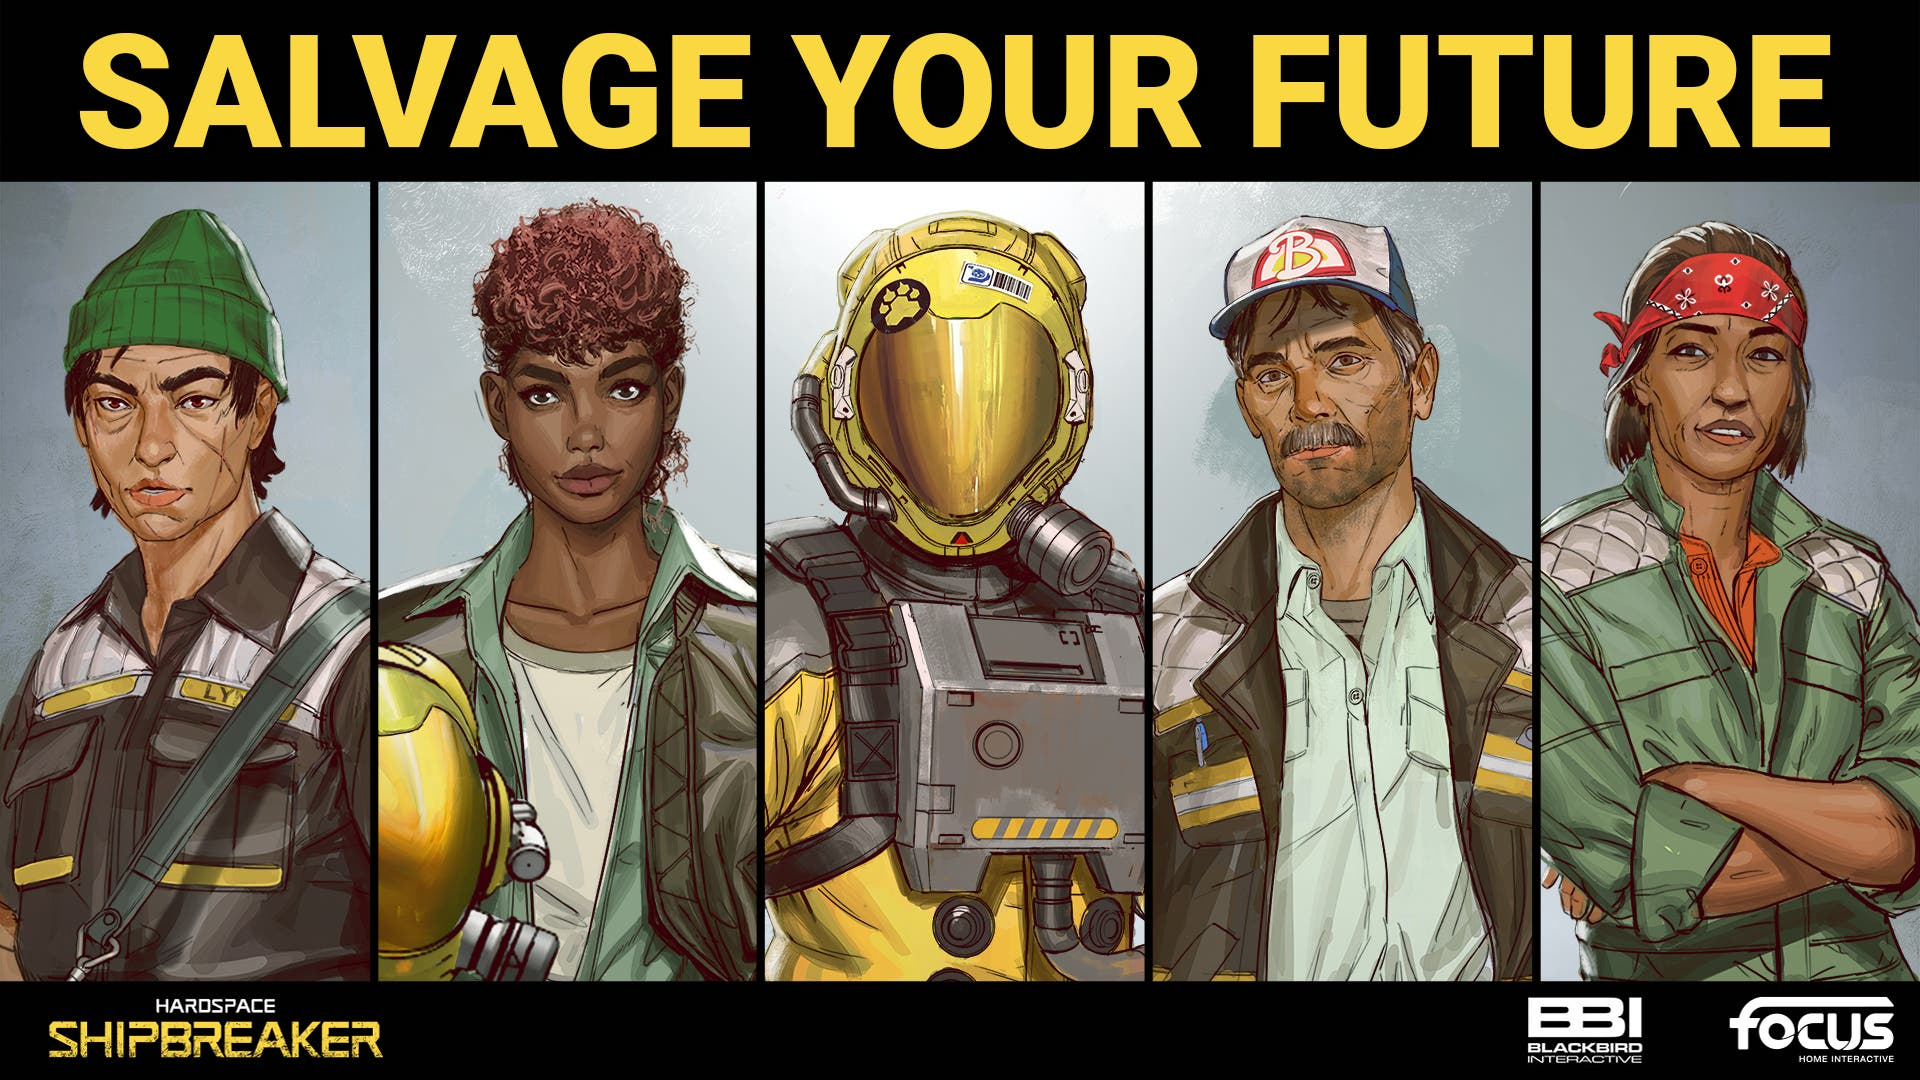 Hardspace Shipbreaker Salvage Your Future Artwork 2